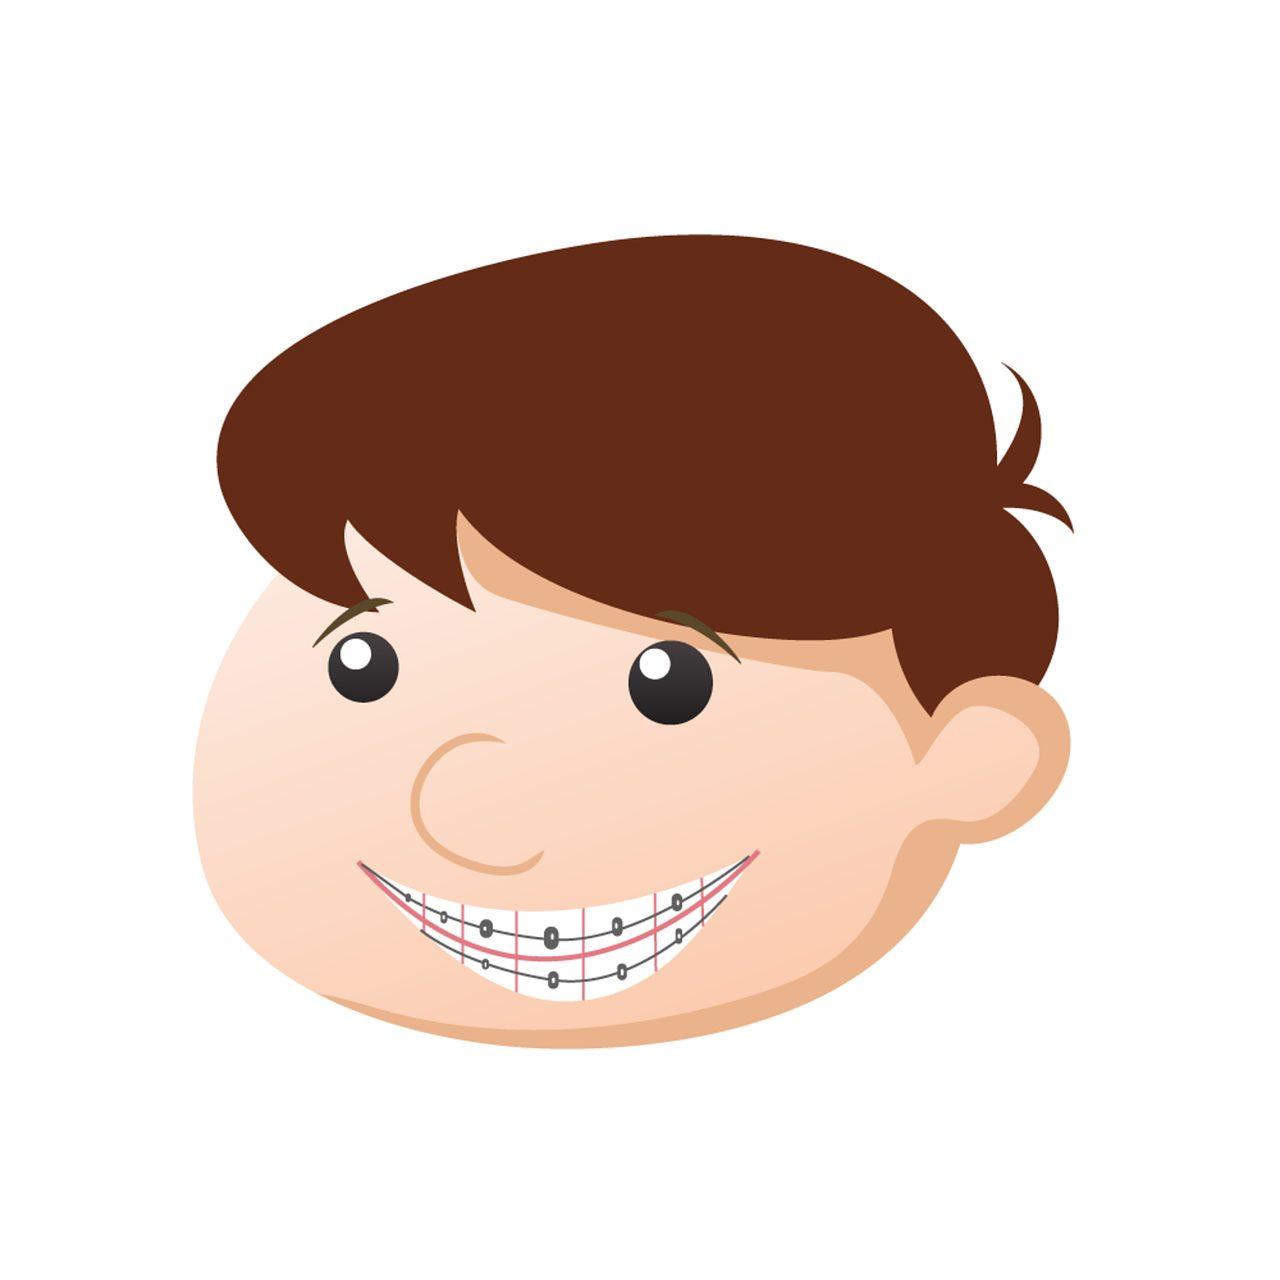 Westerveld K J van tandarts onder narcose